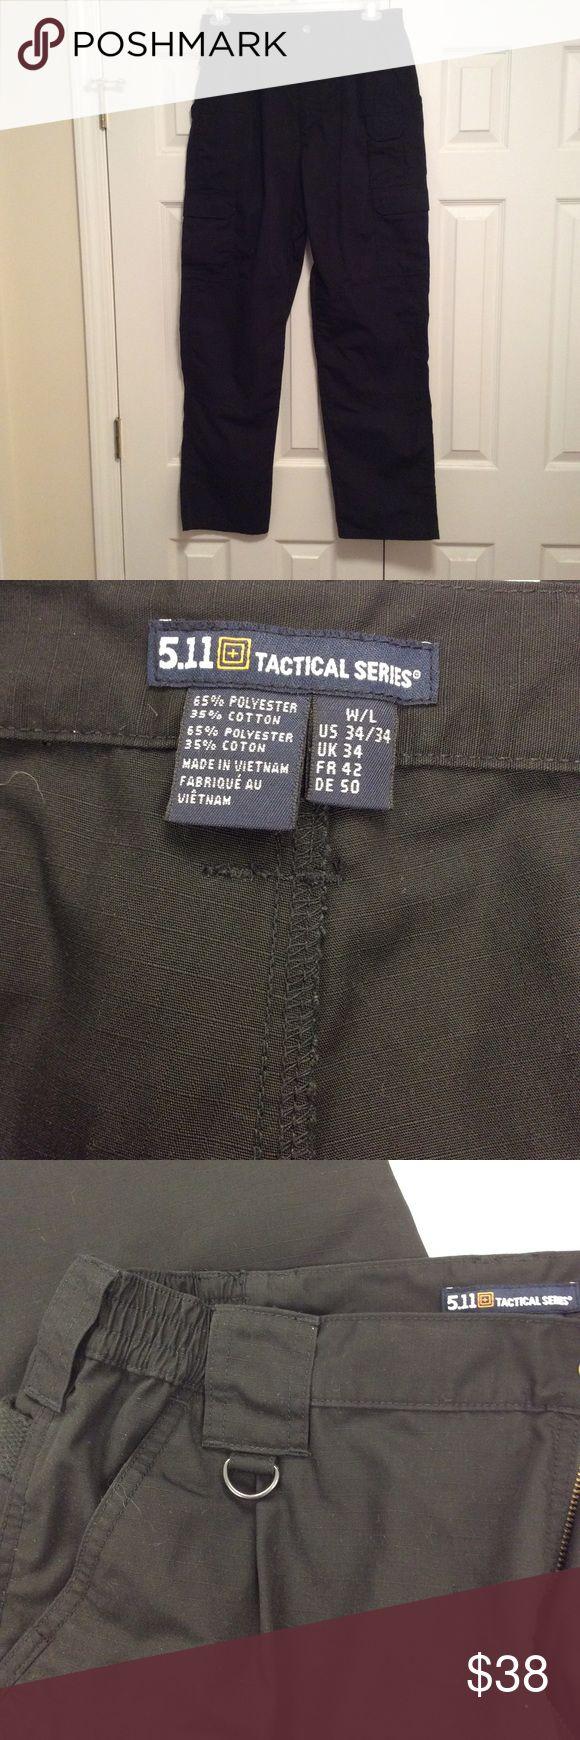 511 Tactical Series Black pants 34/34 511 Tactical Series Black pants 34/34, with action waist band.  EUC 5.11 Tactical Pants Cargo